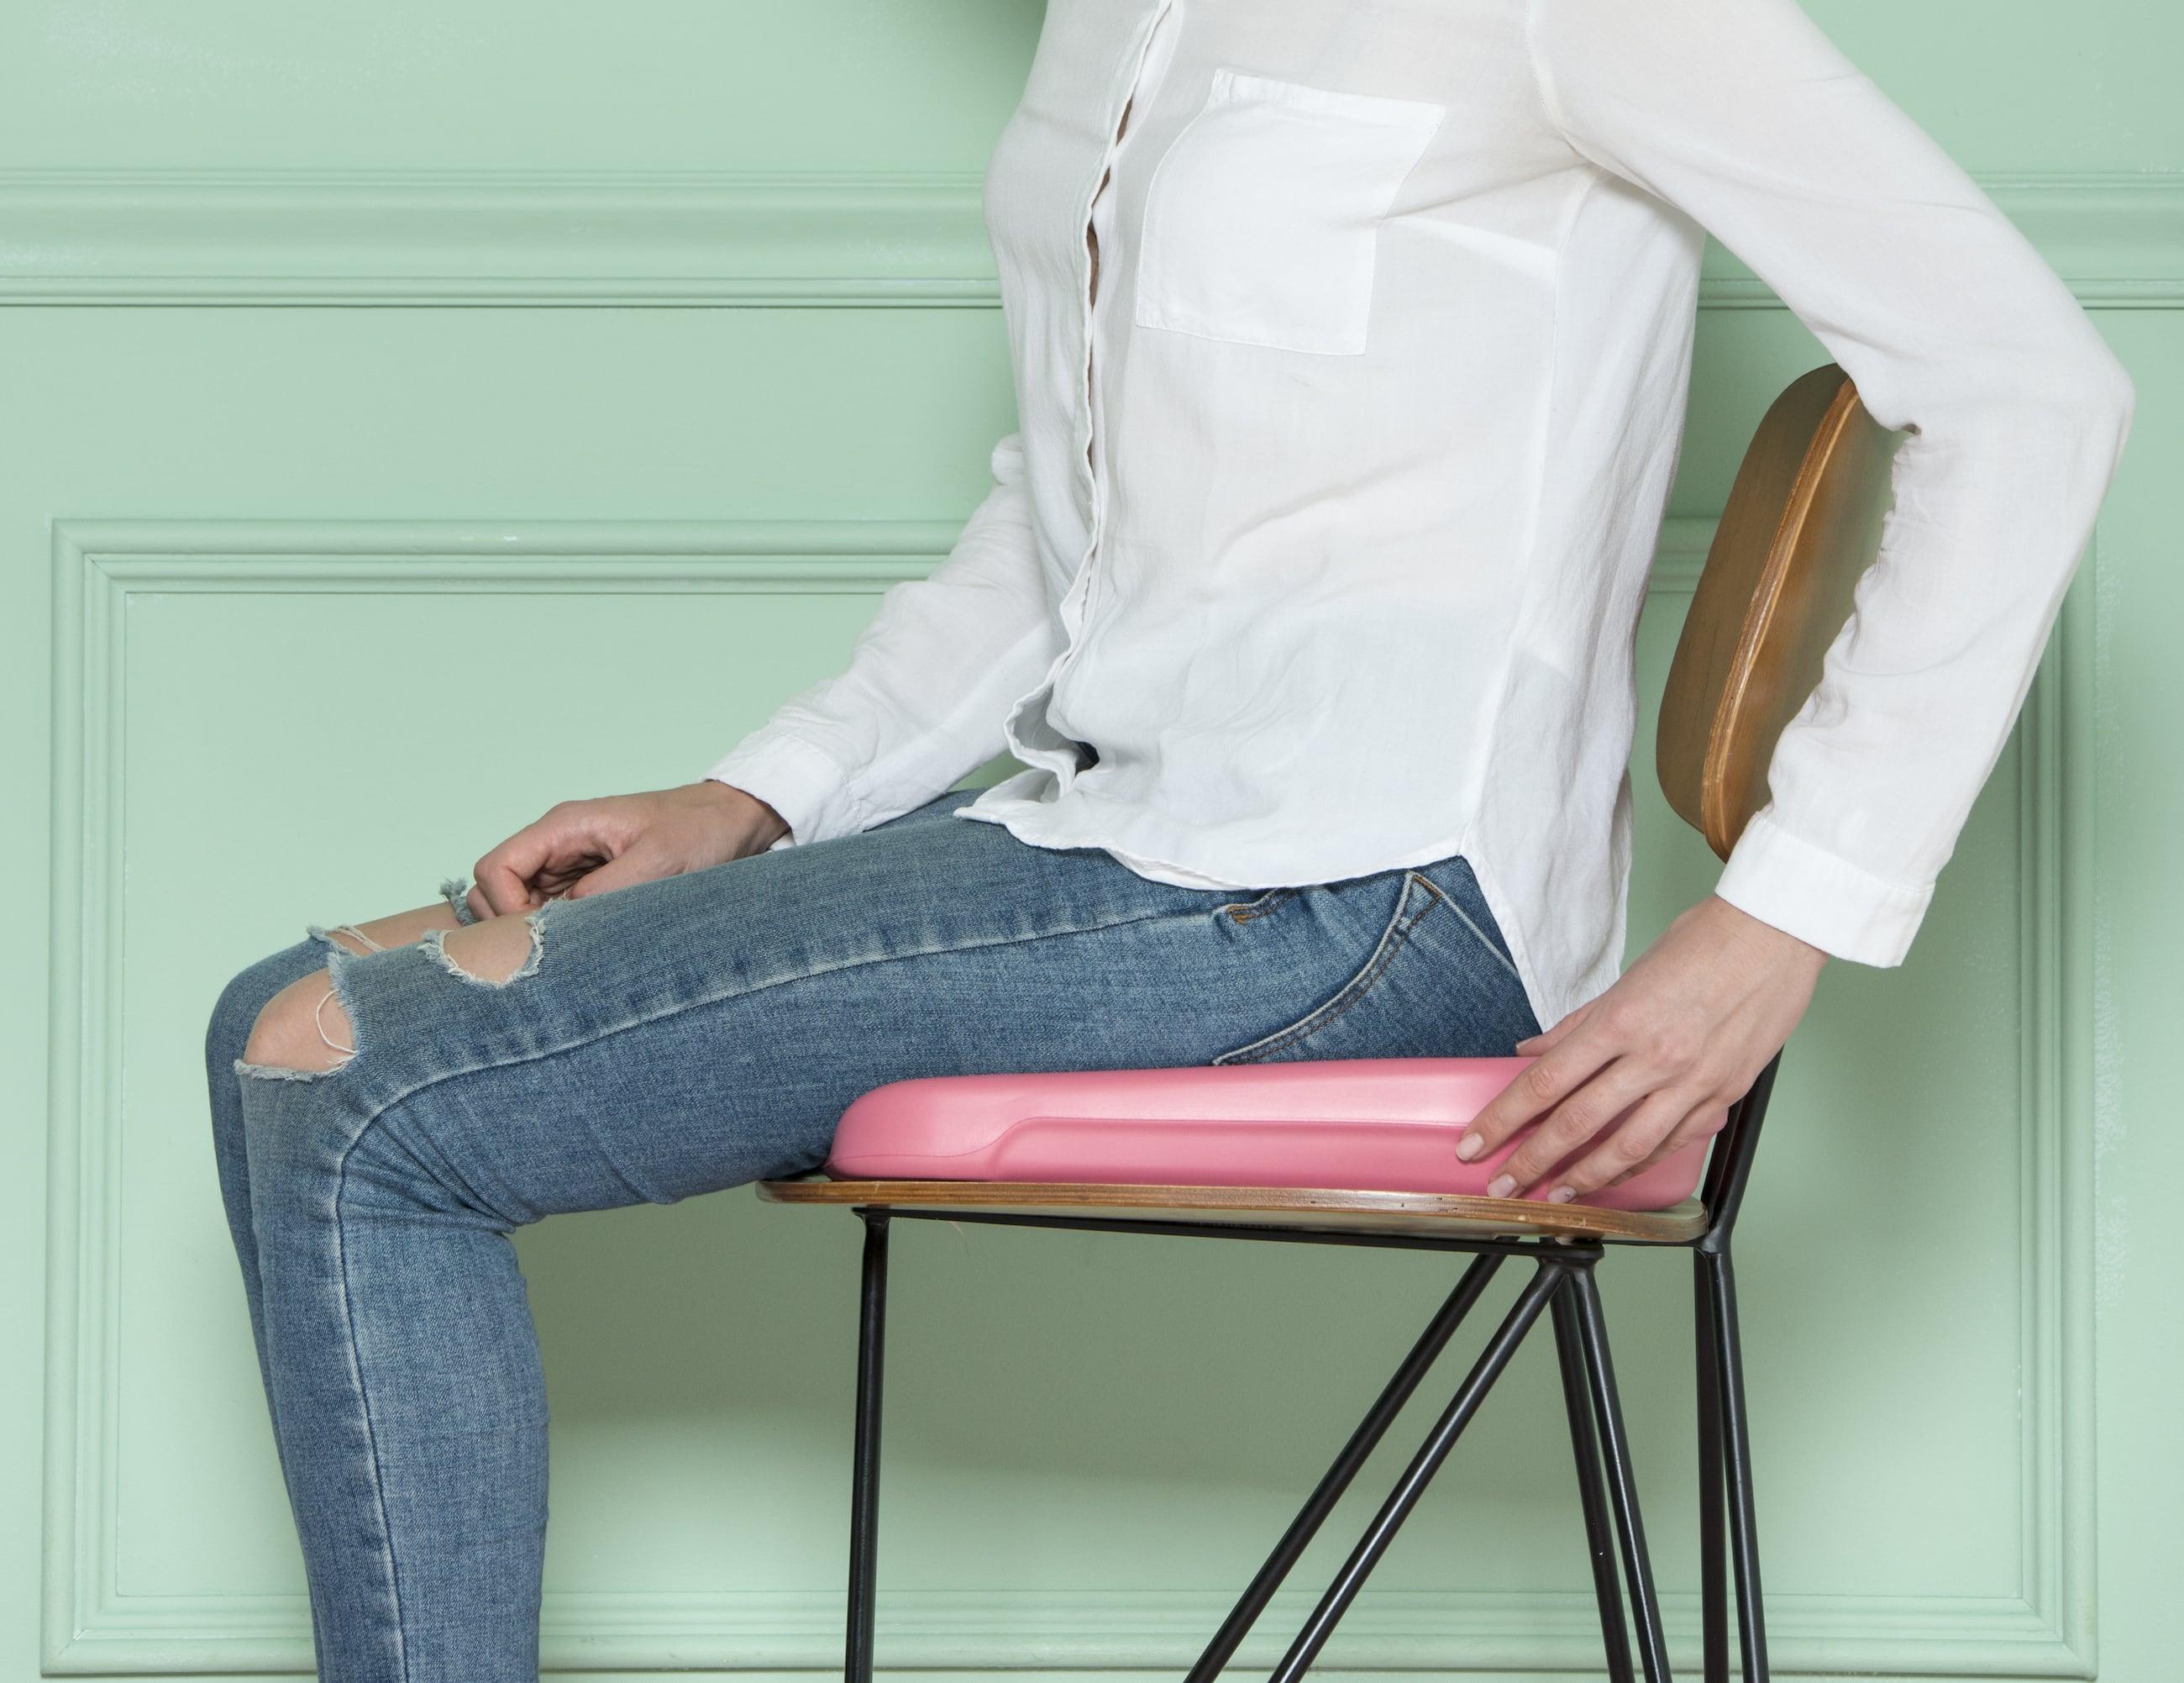 EVA Posture-Improving Cushion provides total comfort anywhere you sit